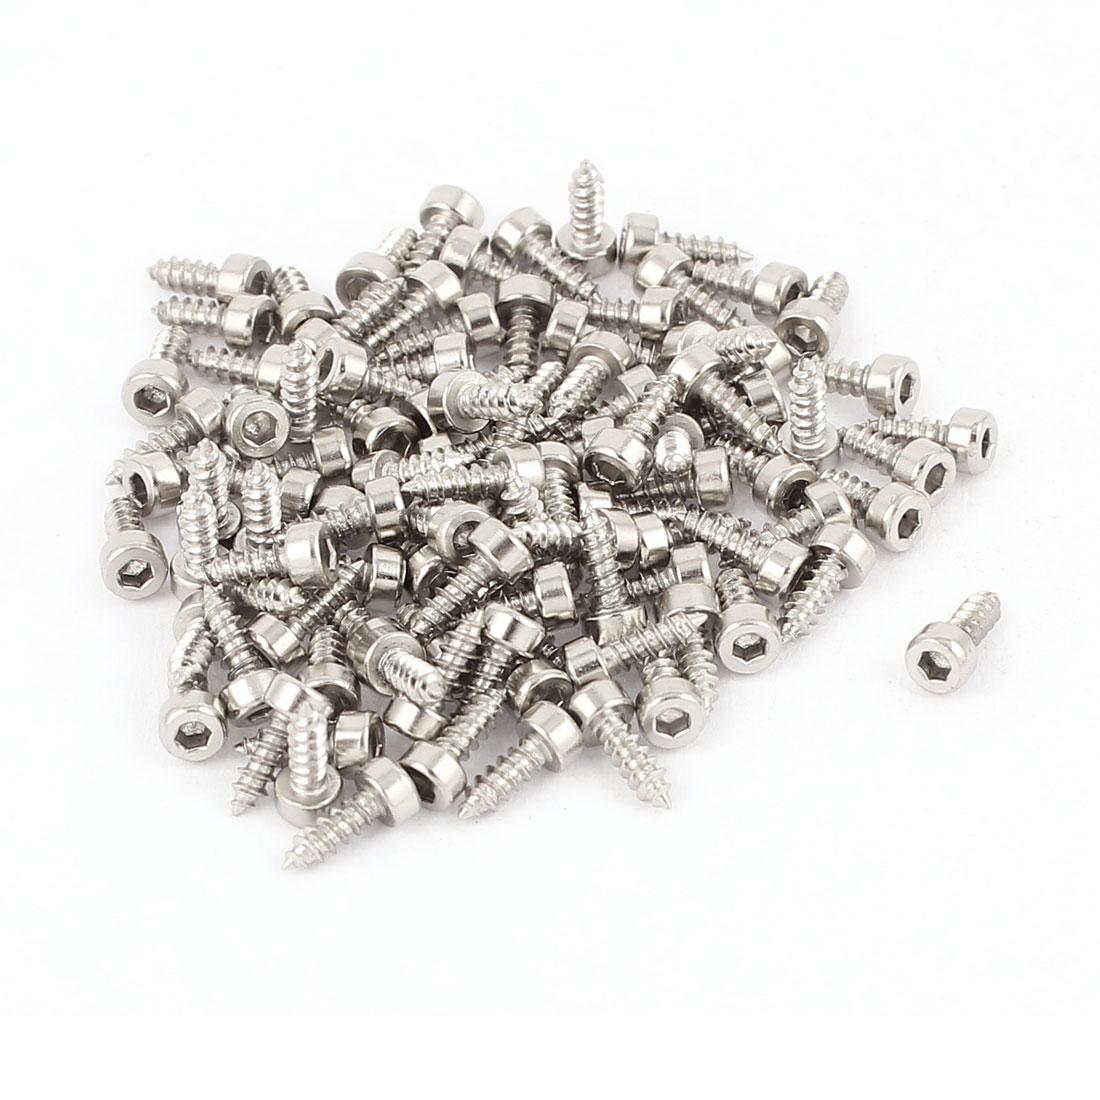 2mm-x-6mm-Male-Thread-Nickel-Plated-Hex-Head-Self-Tapping-Screws-100-Pcs